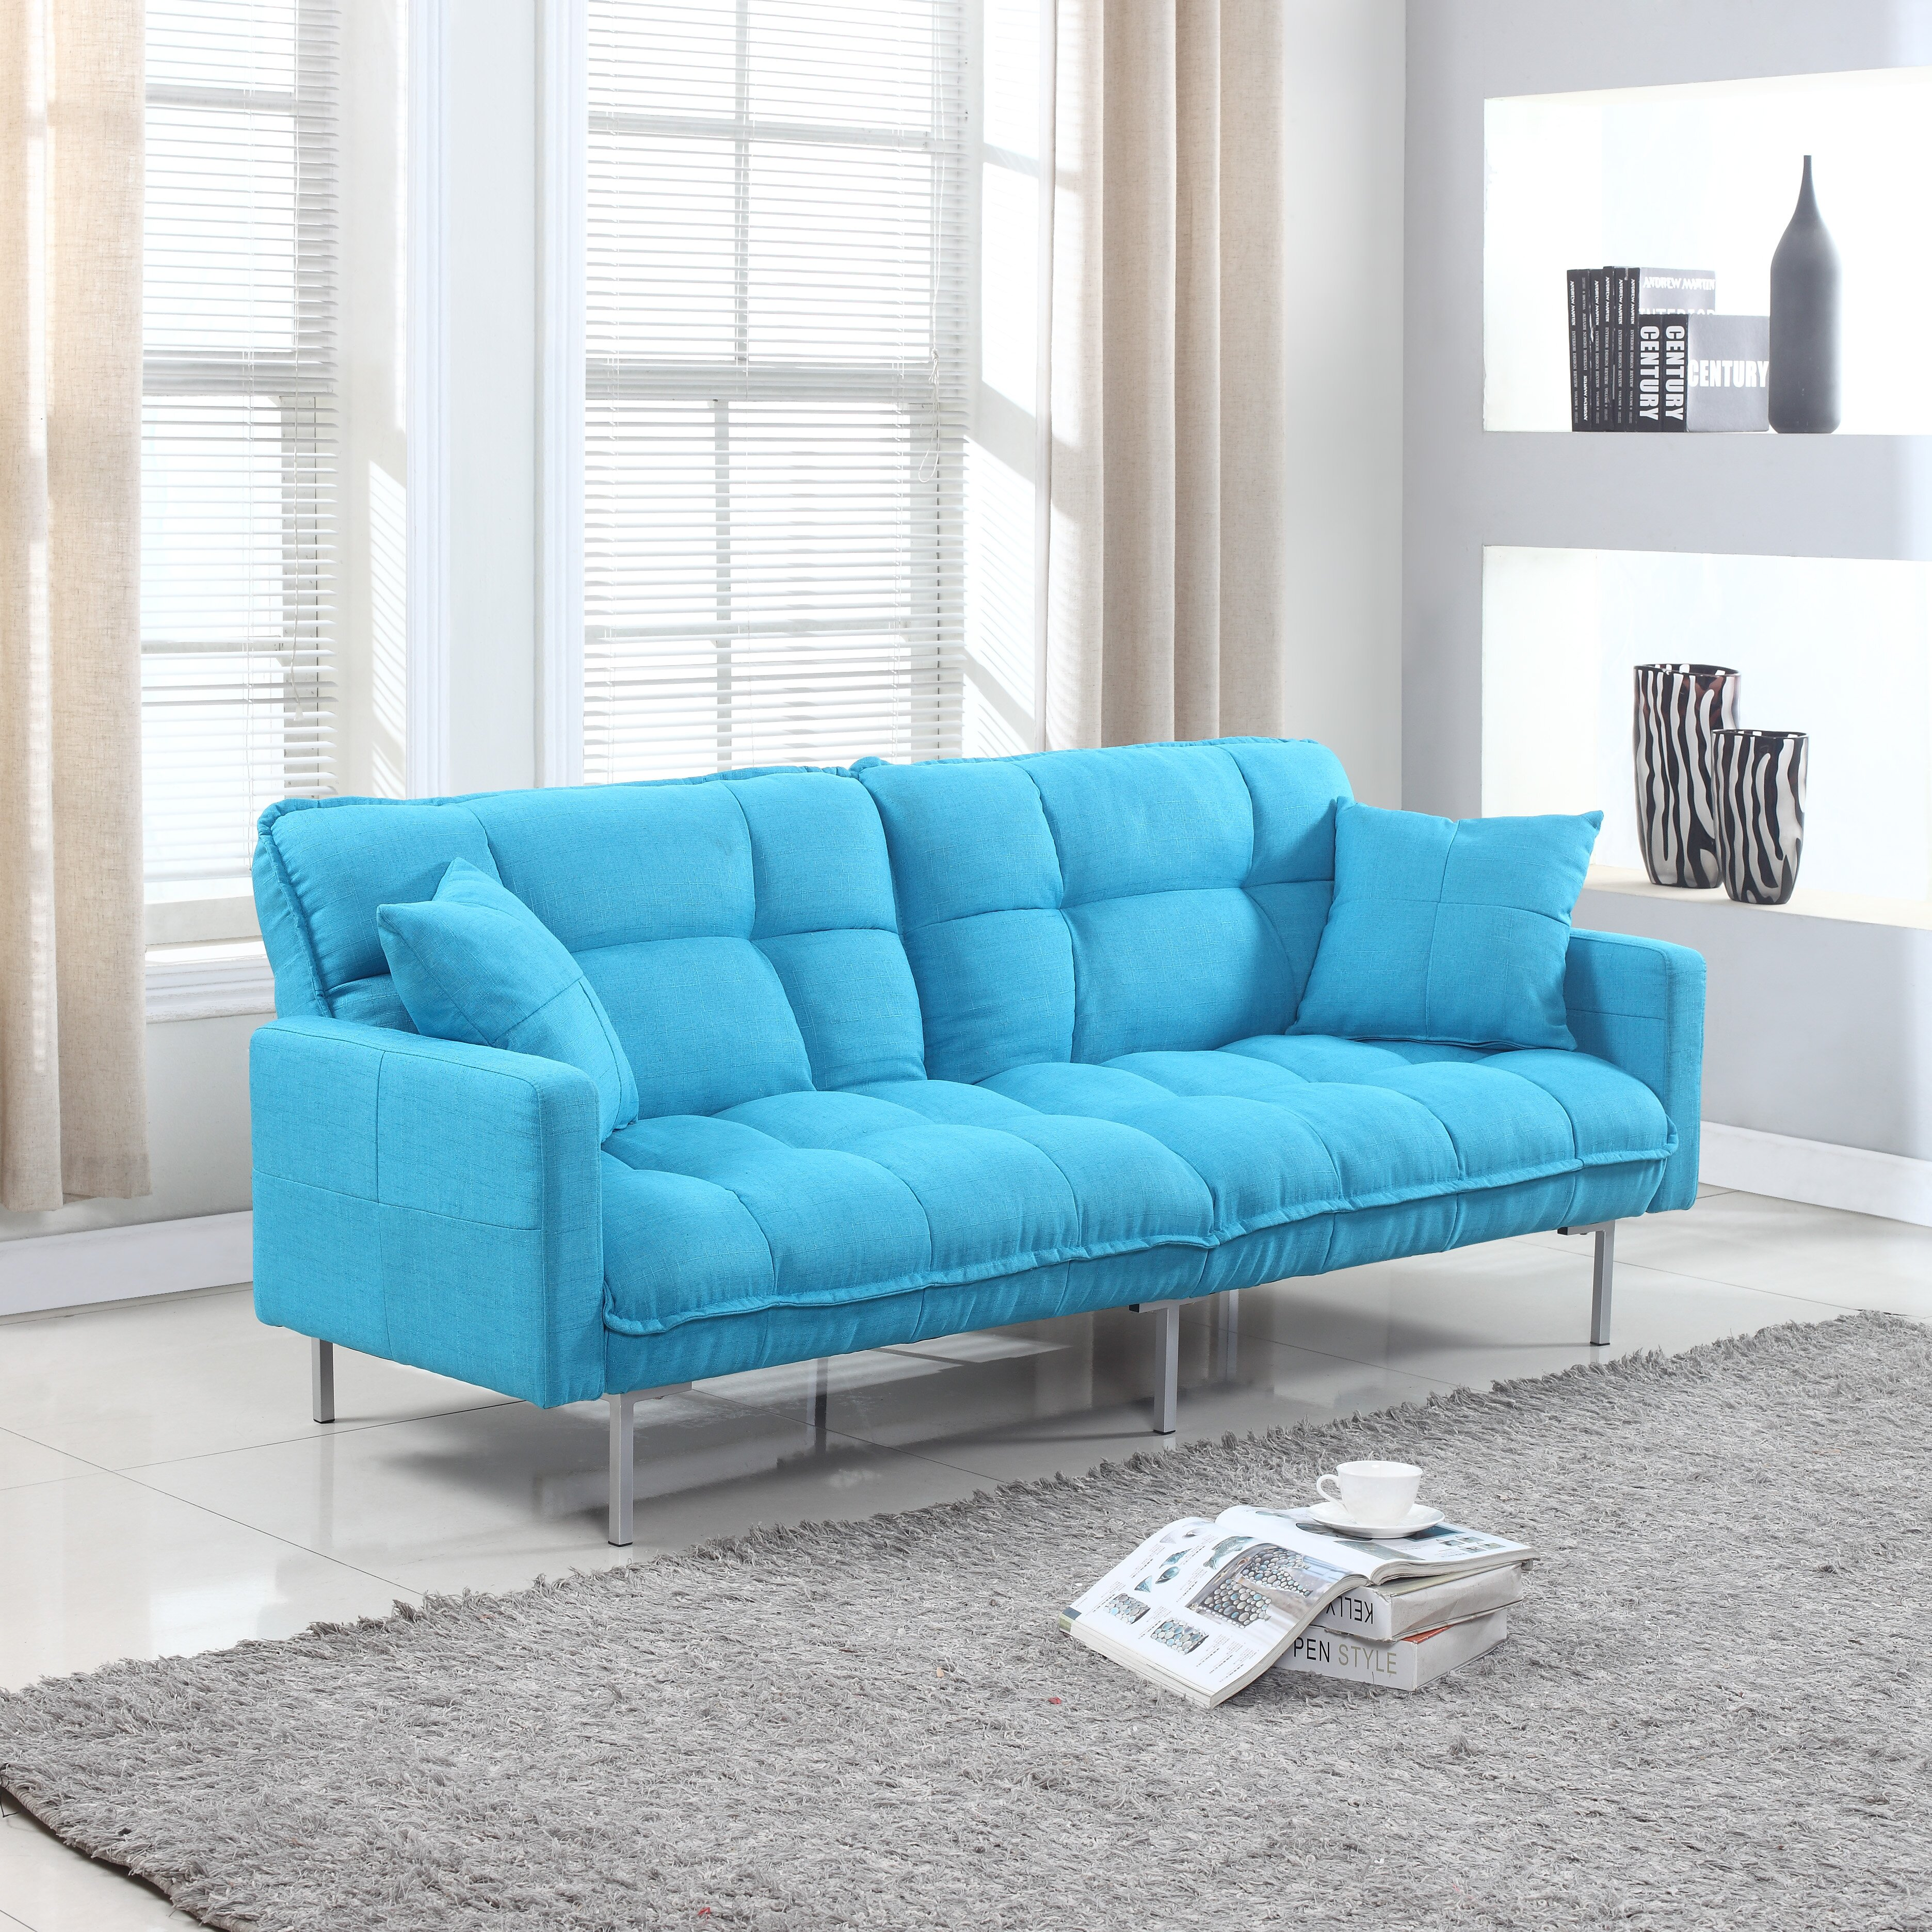 Plush Sofas Review Hereo Sofa